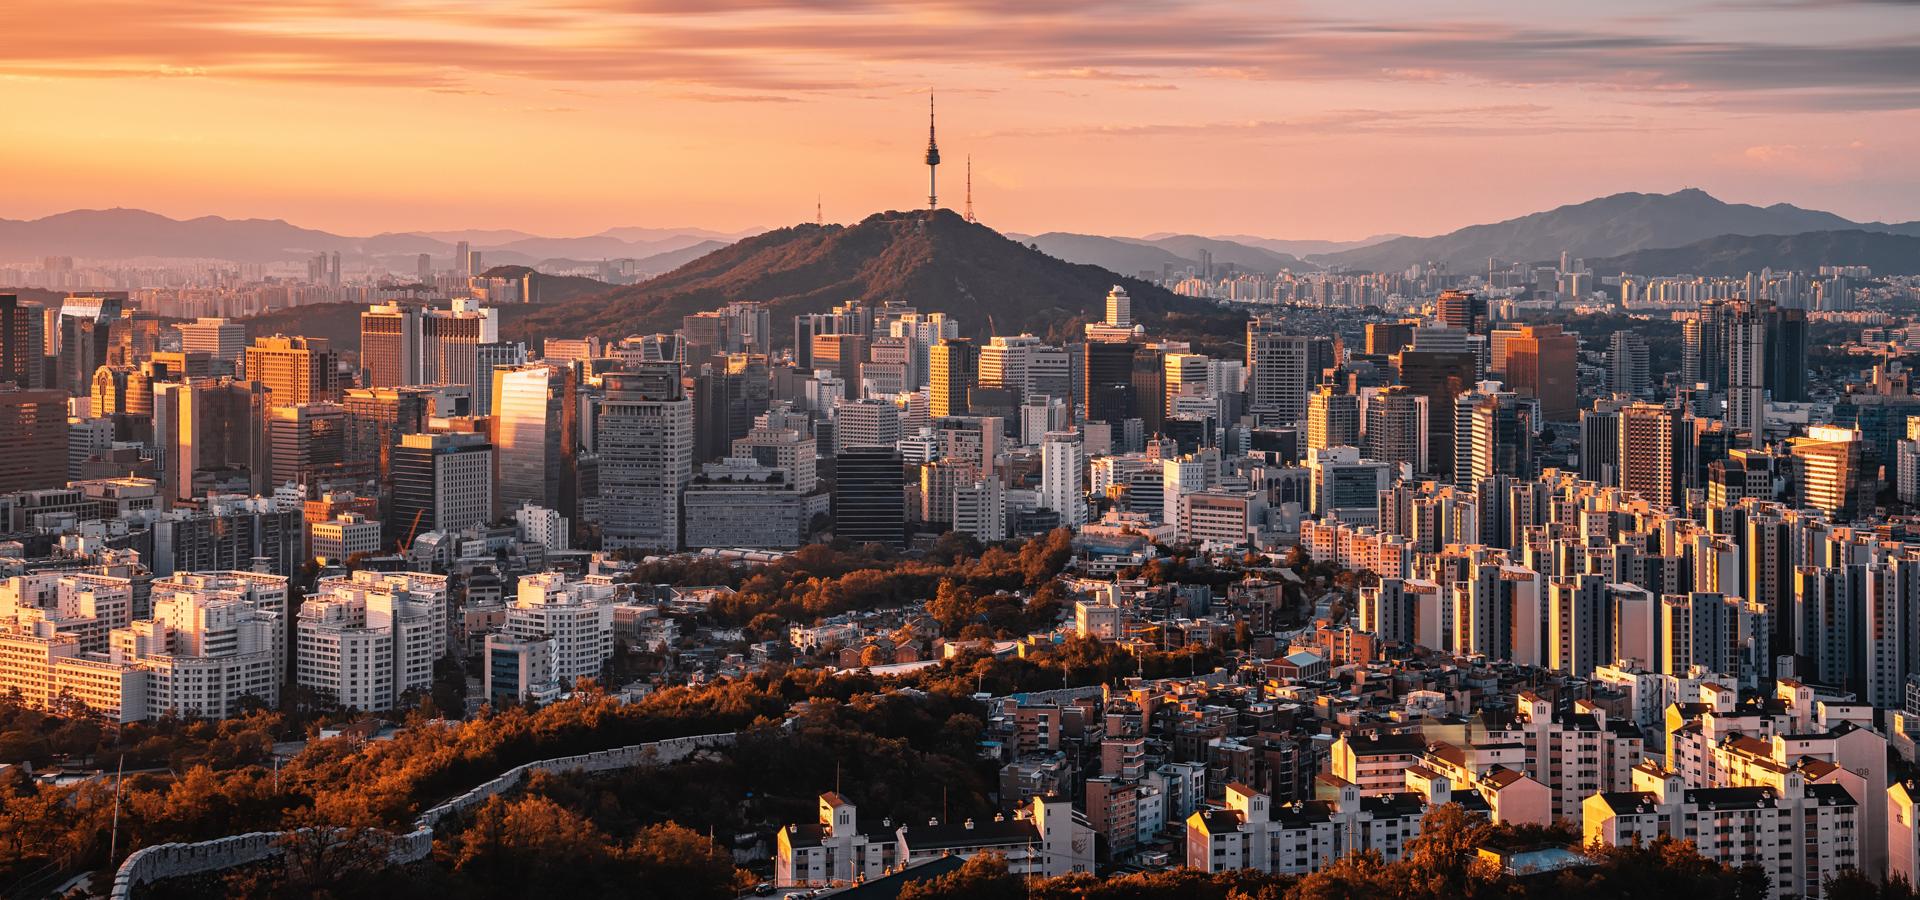 Peer-to-peer advisory in Seoul, Seoul-t'ukpyolsi, South Korea